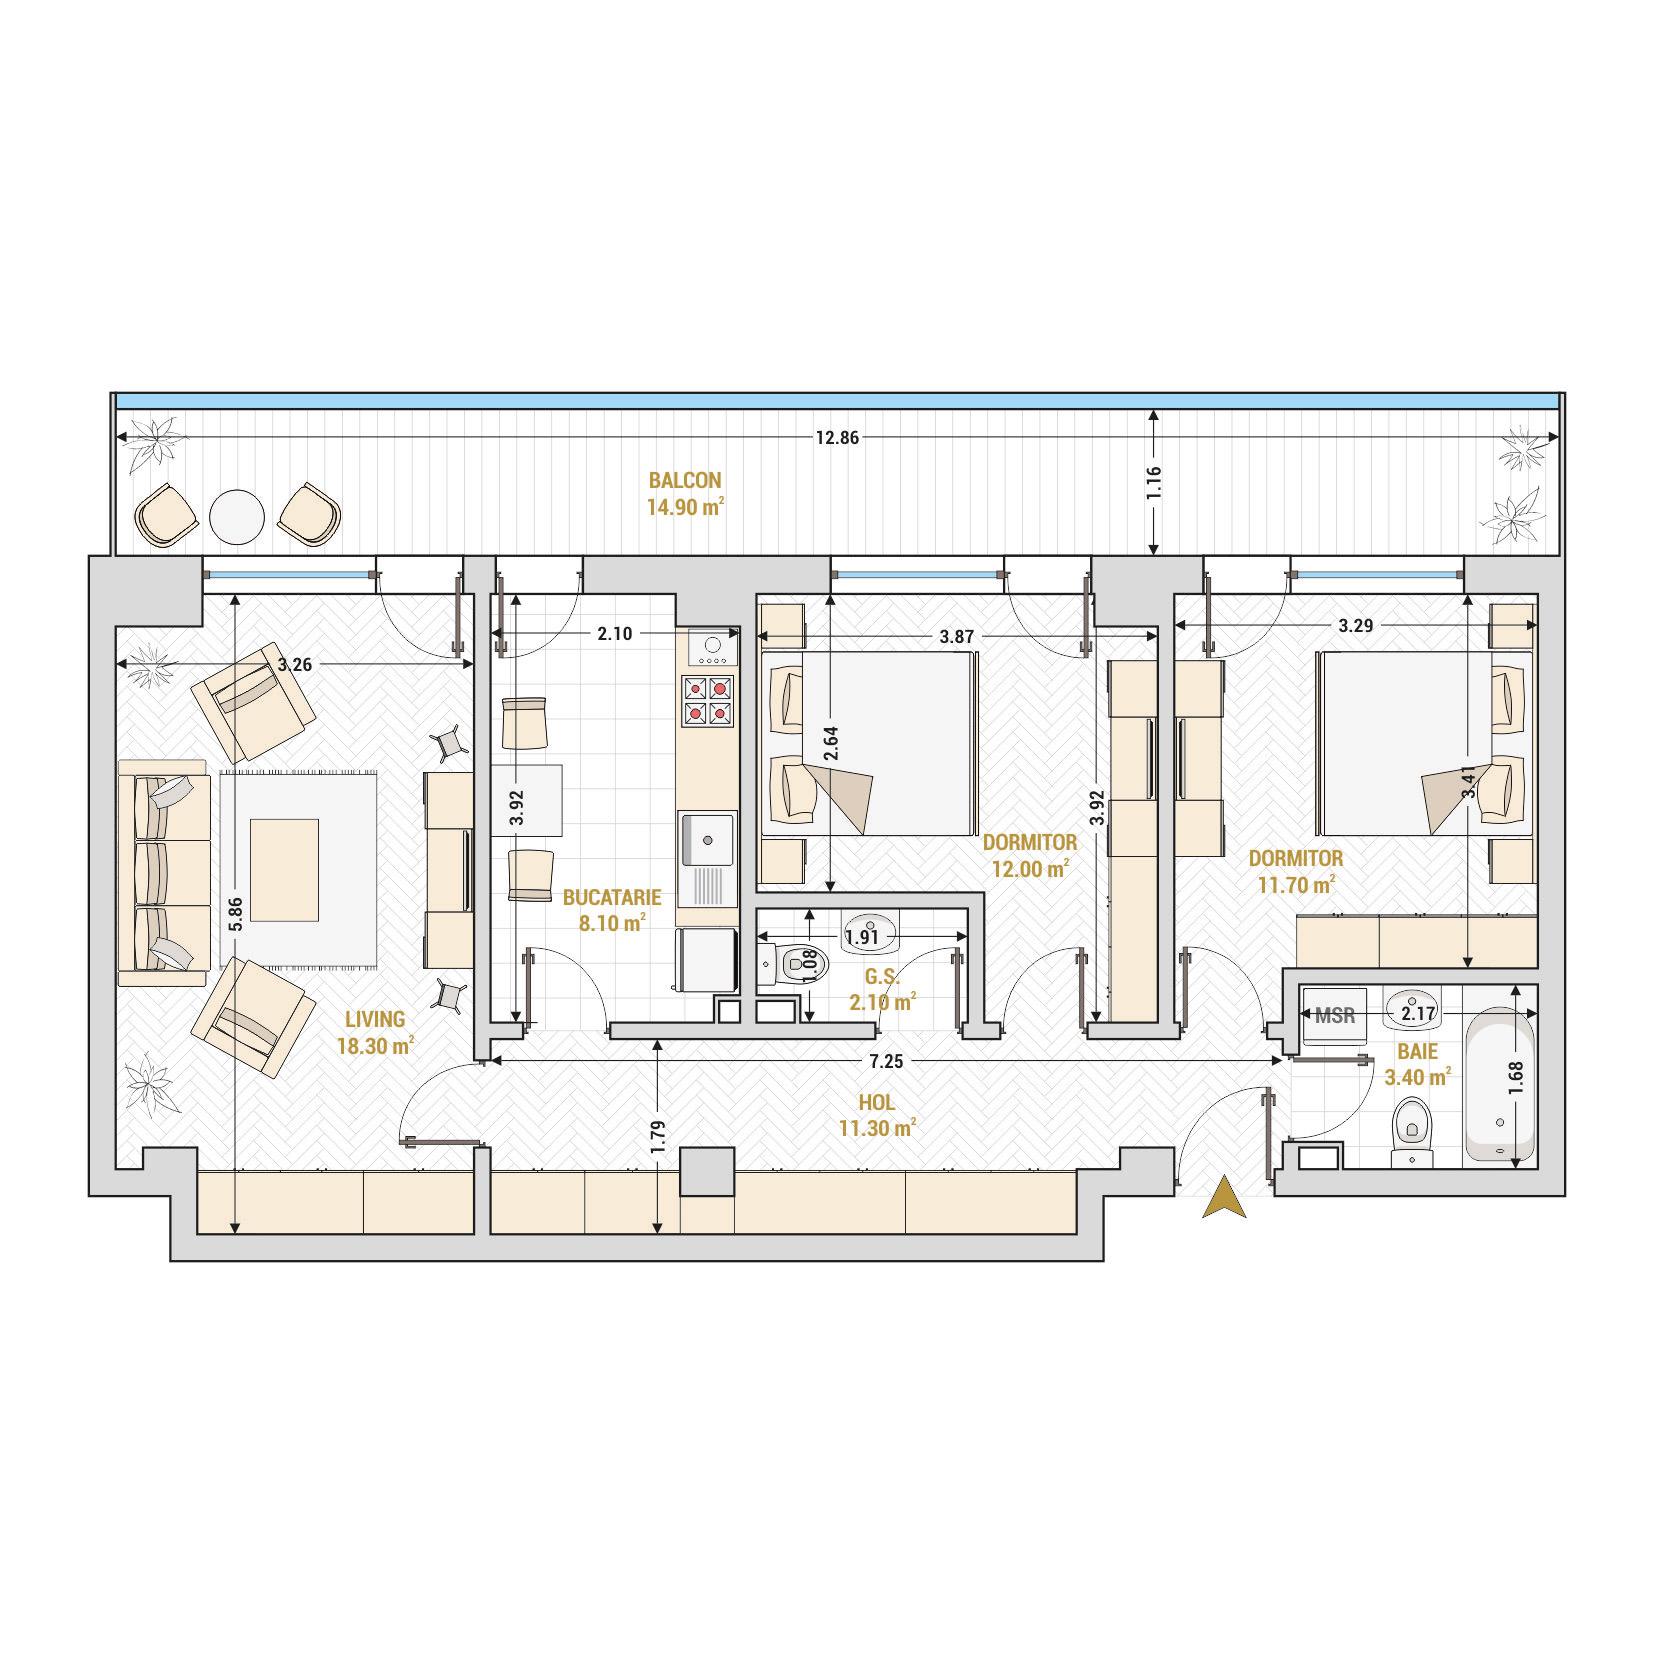 Apartamente cu 3 camere Bucuresti - Catedral Residence - Marriott, Piata Unirii, 13 Septembrie, Izvor - Suprafata utila totala - 81.80metri patrati